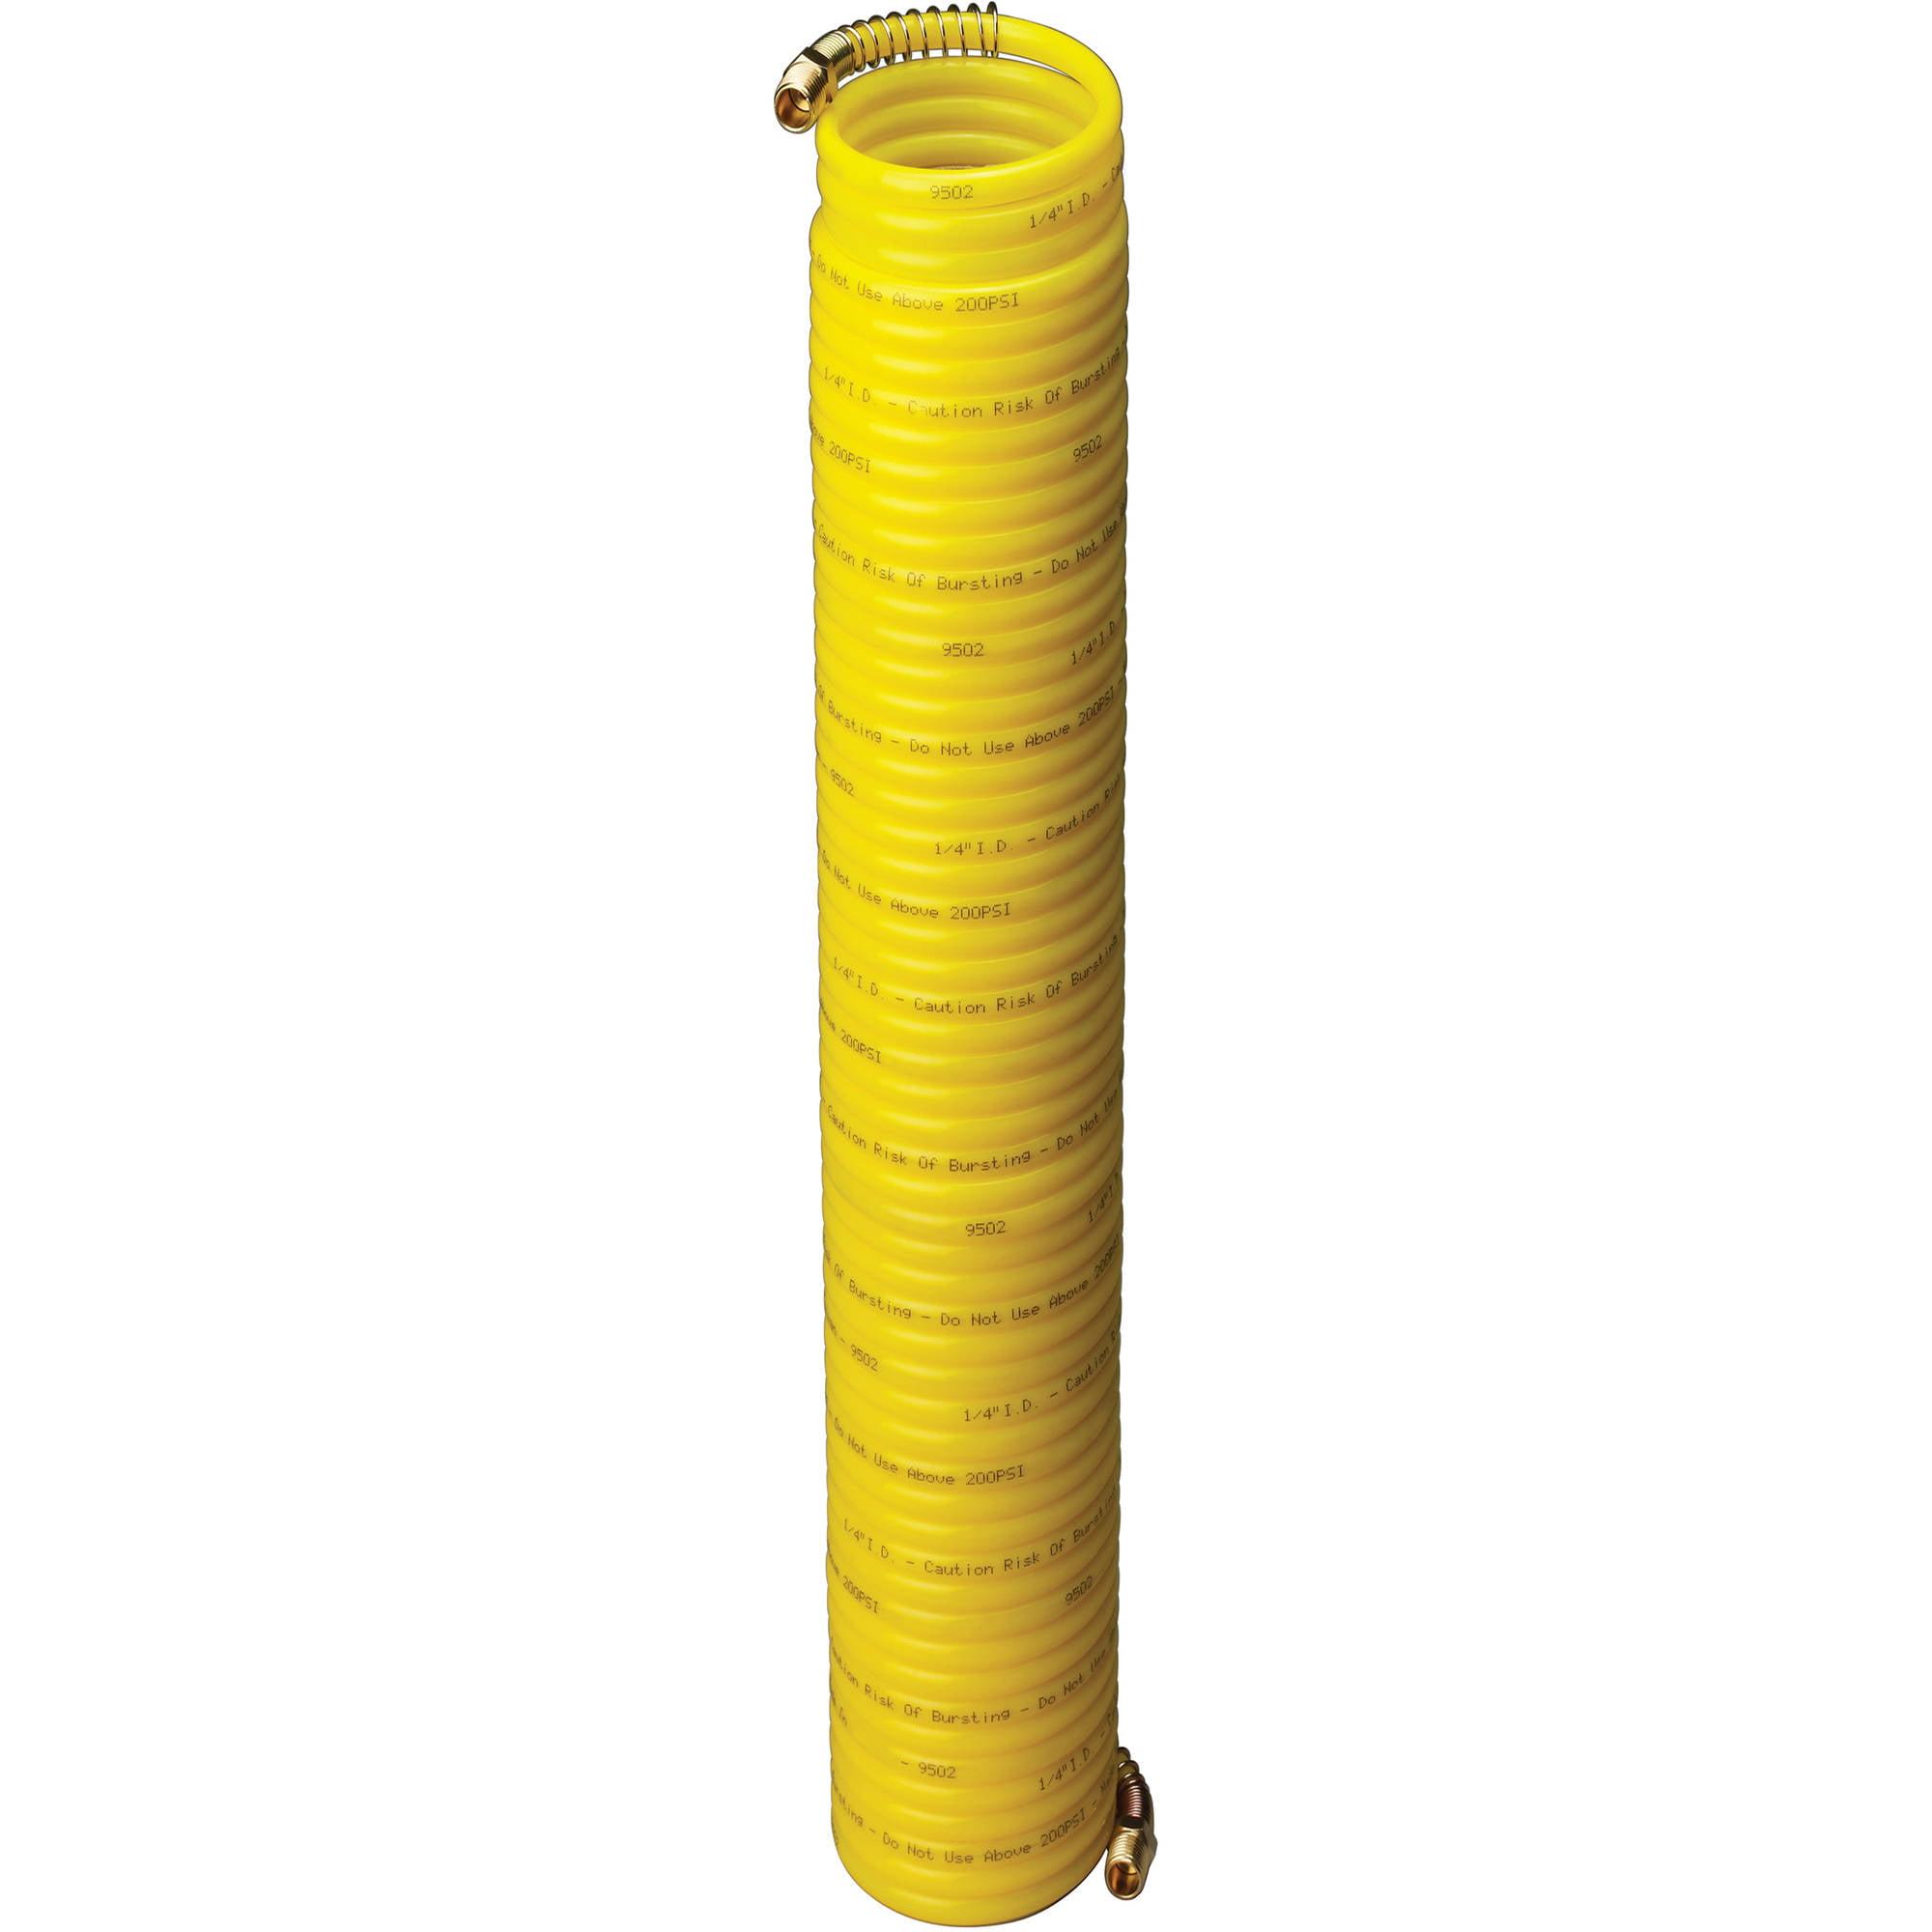 Amflo Nylon Recoil Air Hose by Amflo